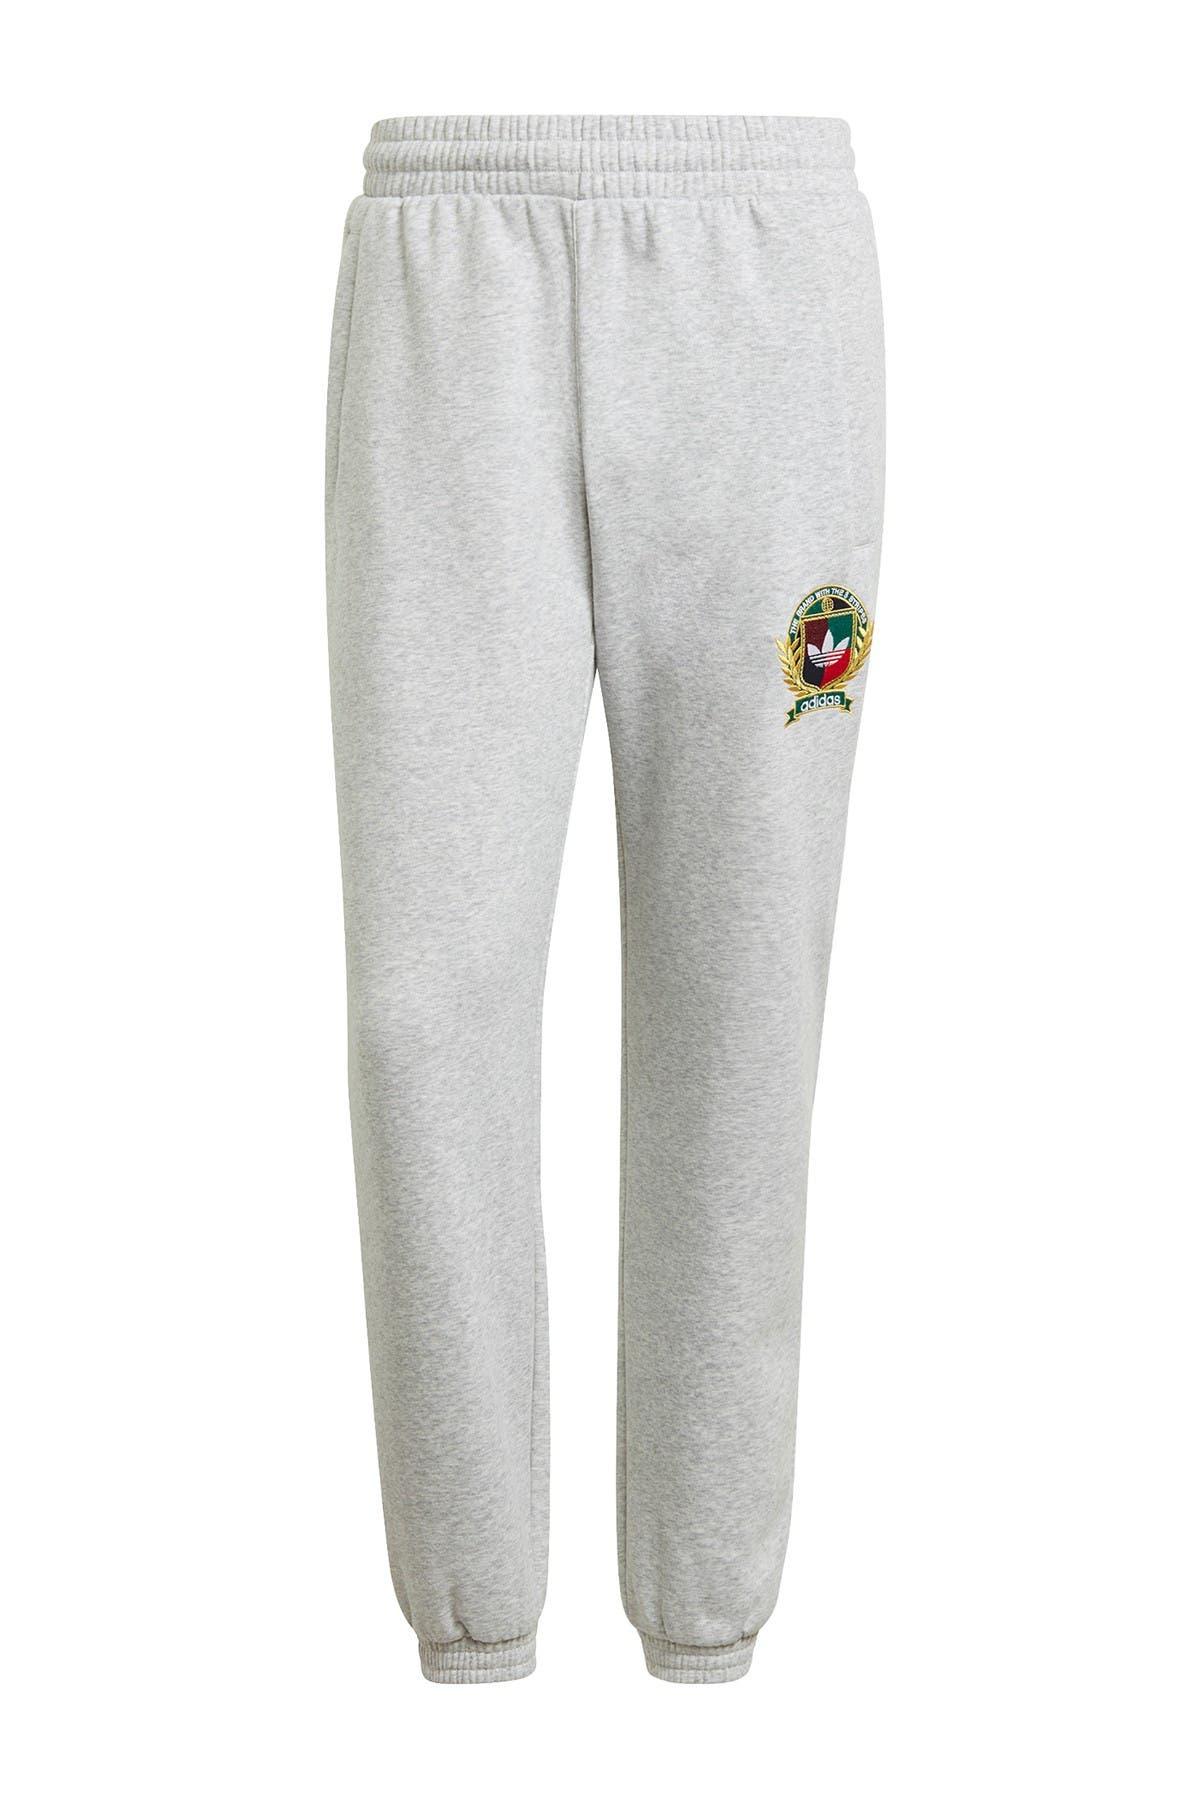 Image of adidas Crest Pants